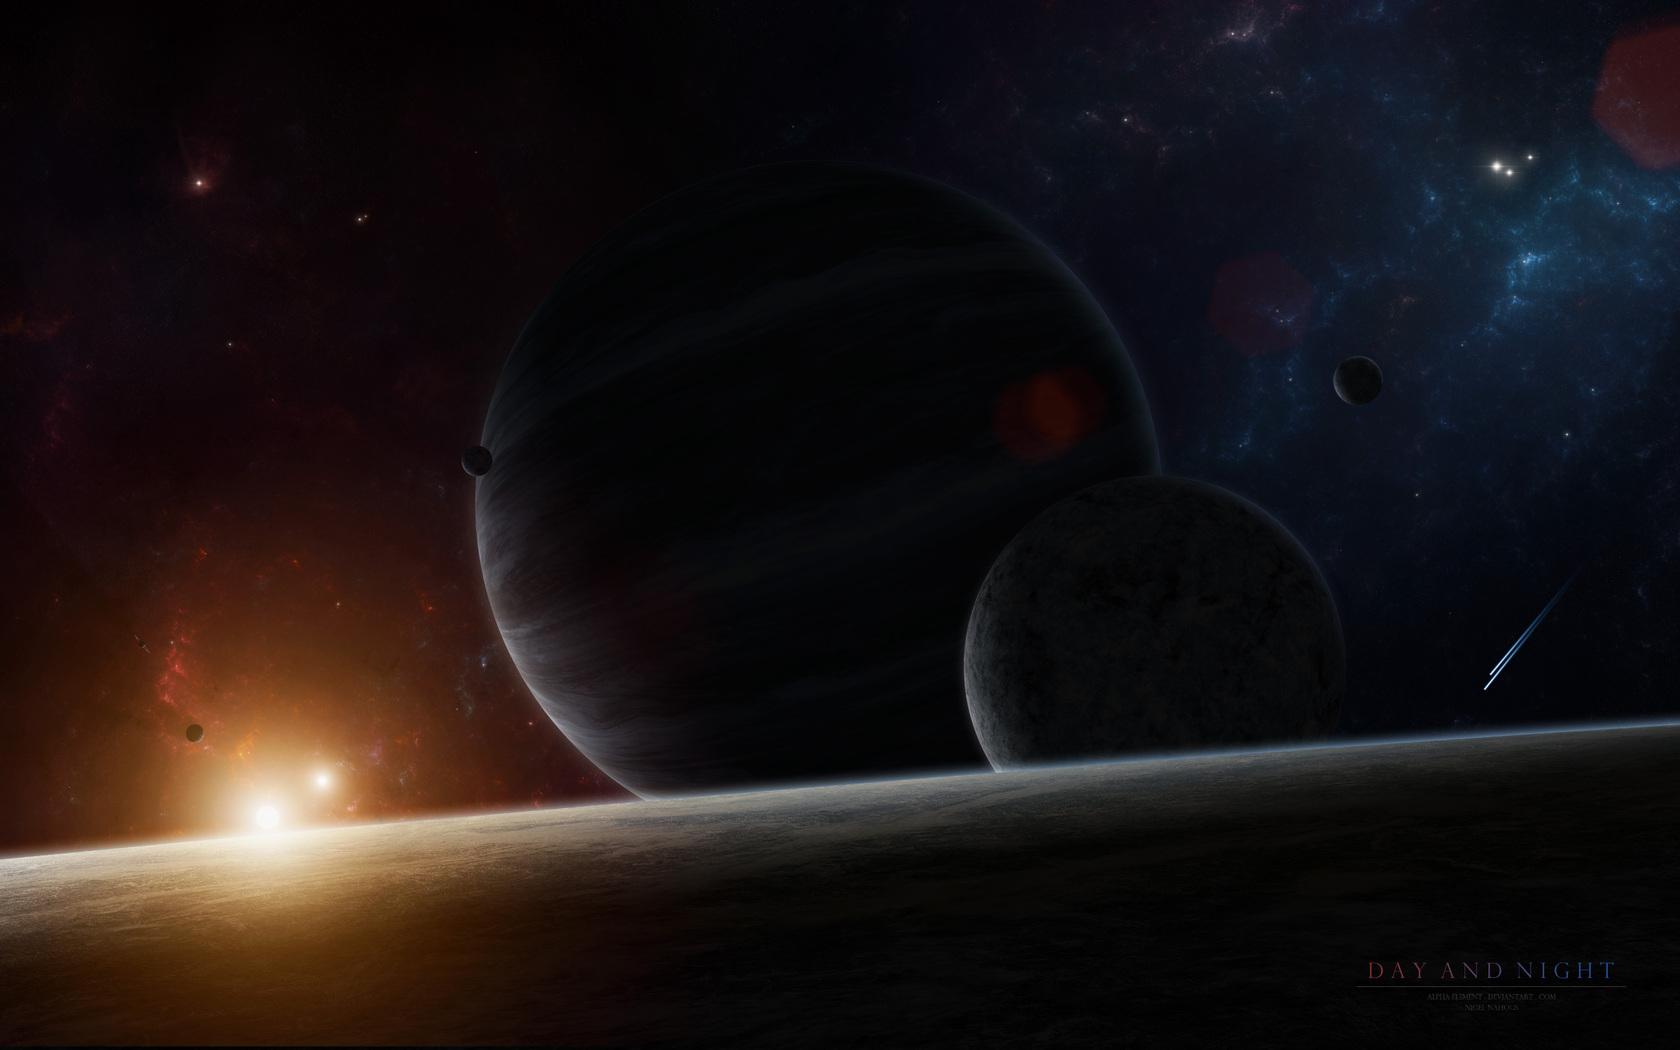 day-and-night-scifi-5k-e0.jpg